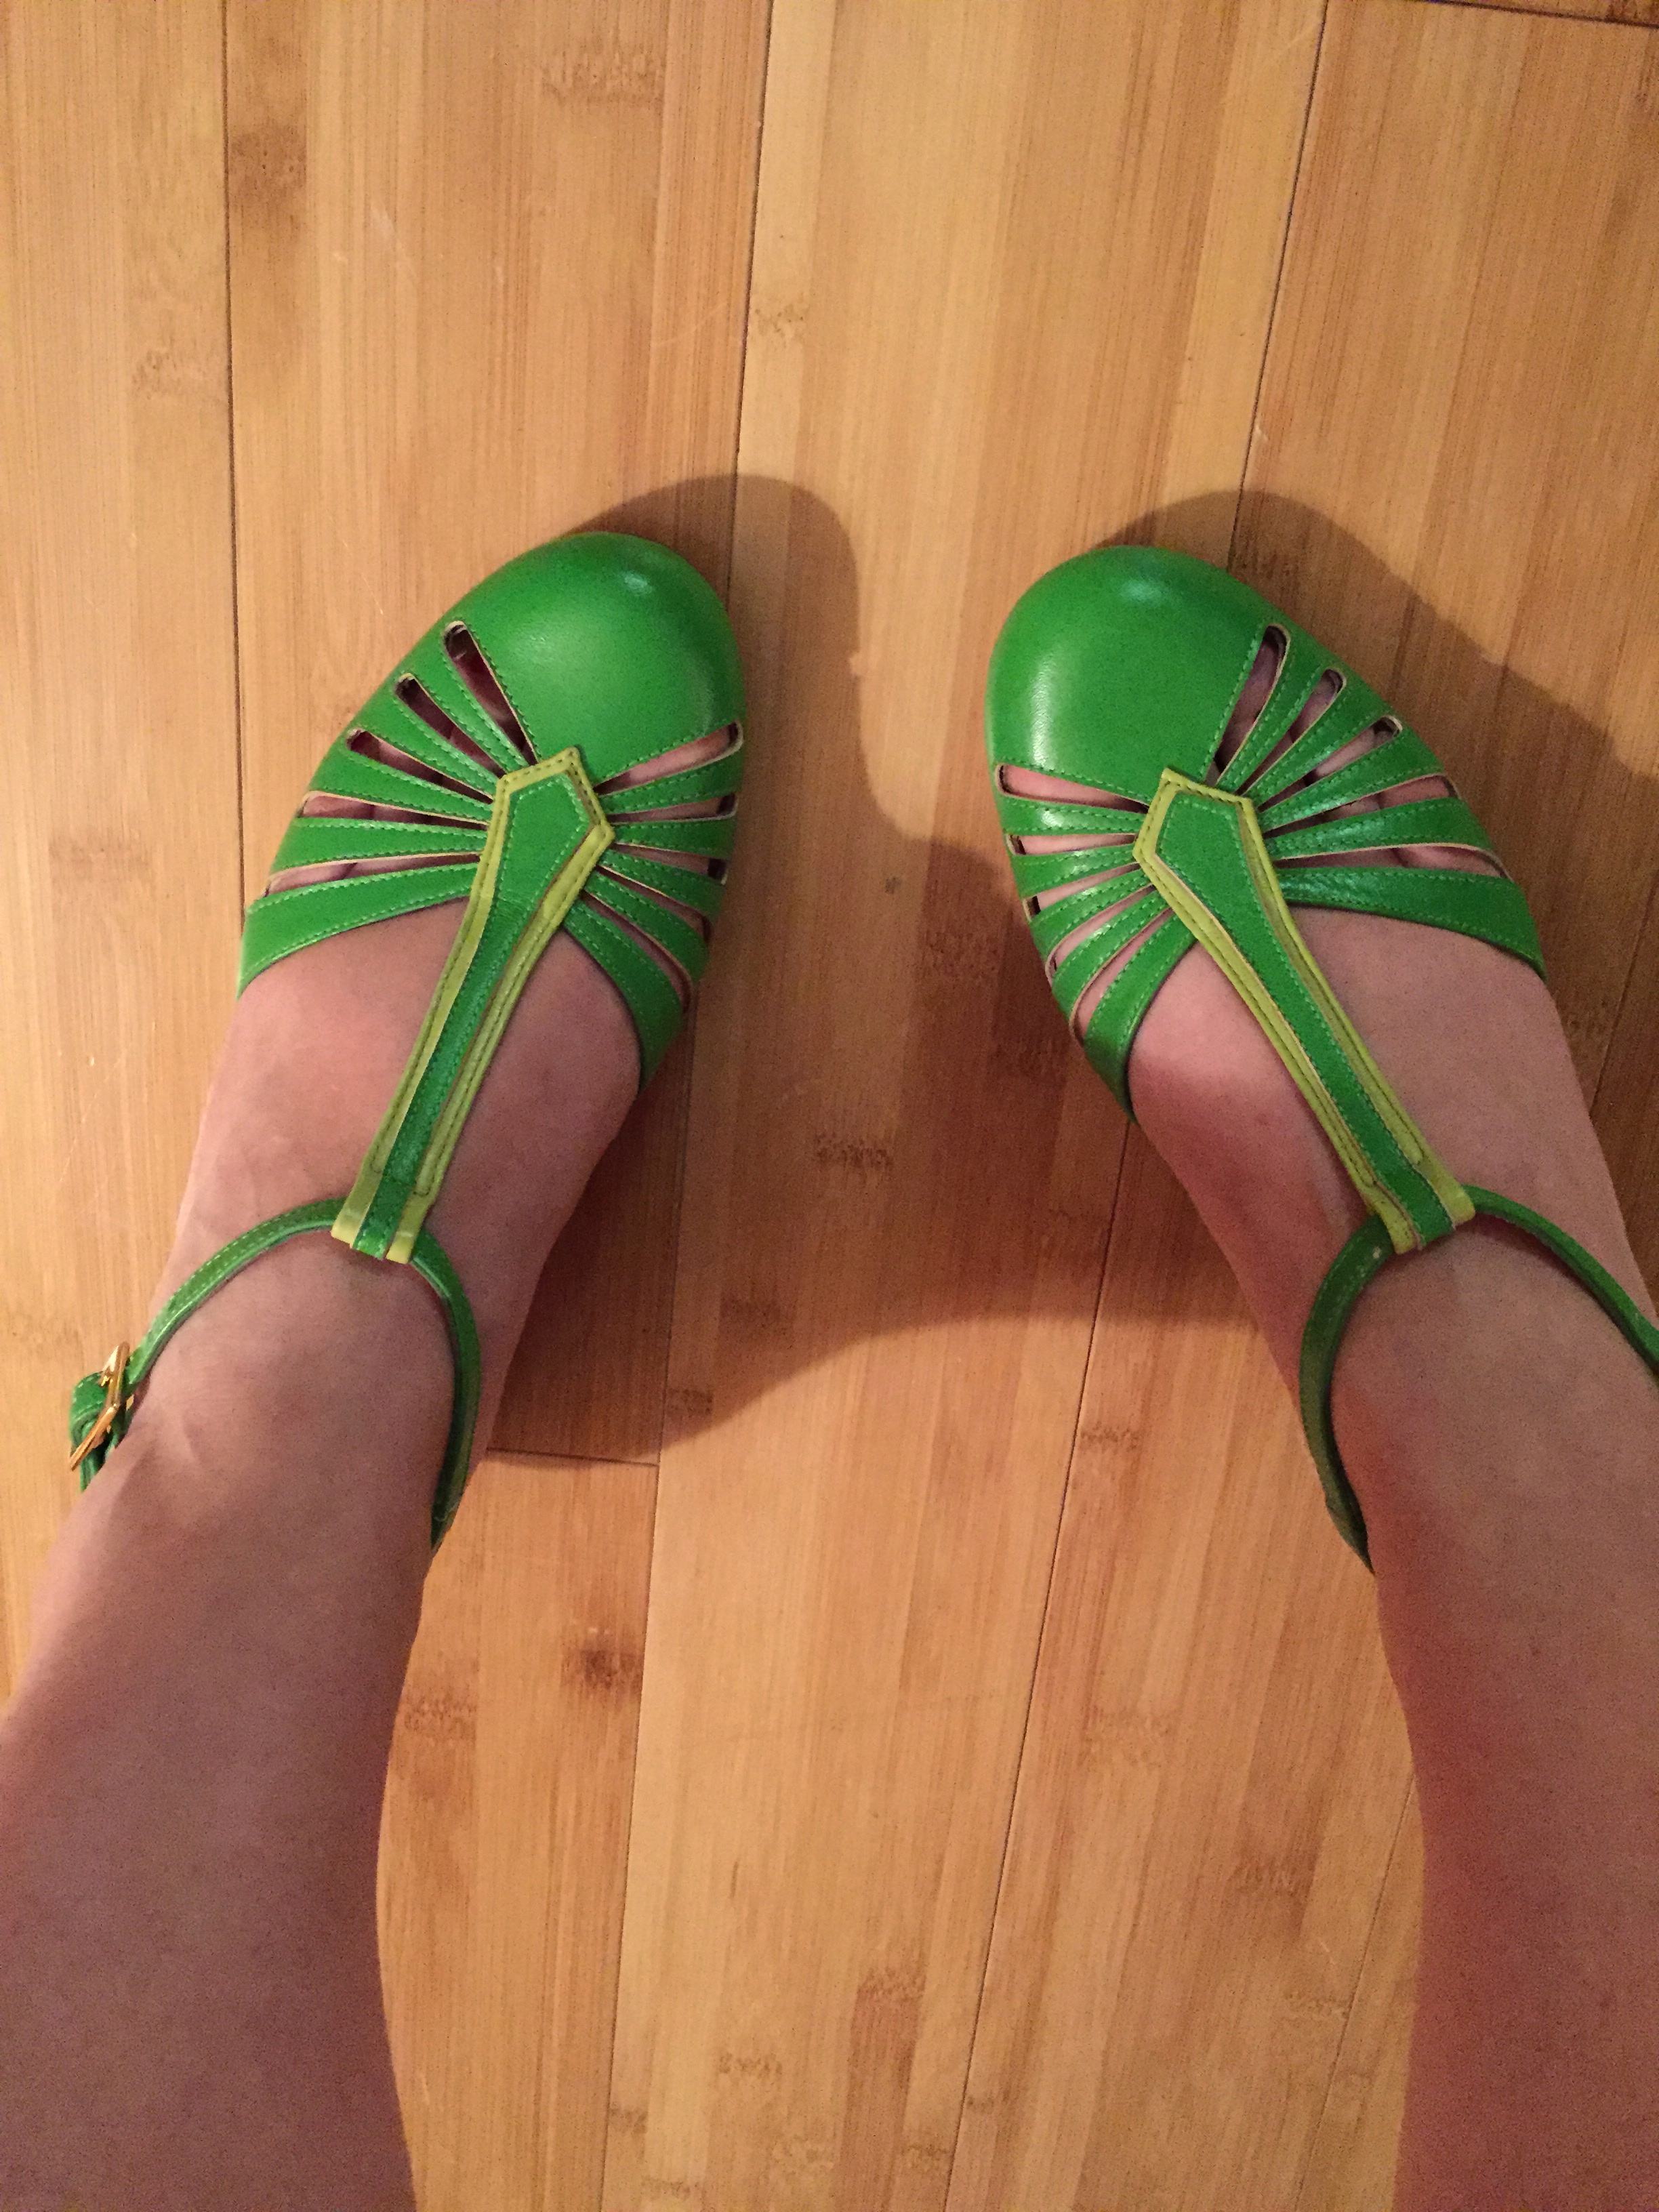 dancing-get-hip-put-shoes-swinging